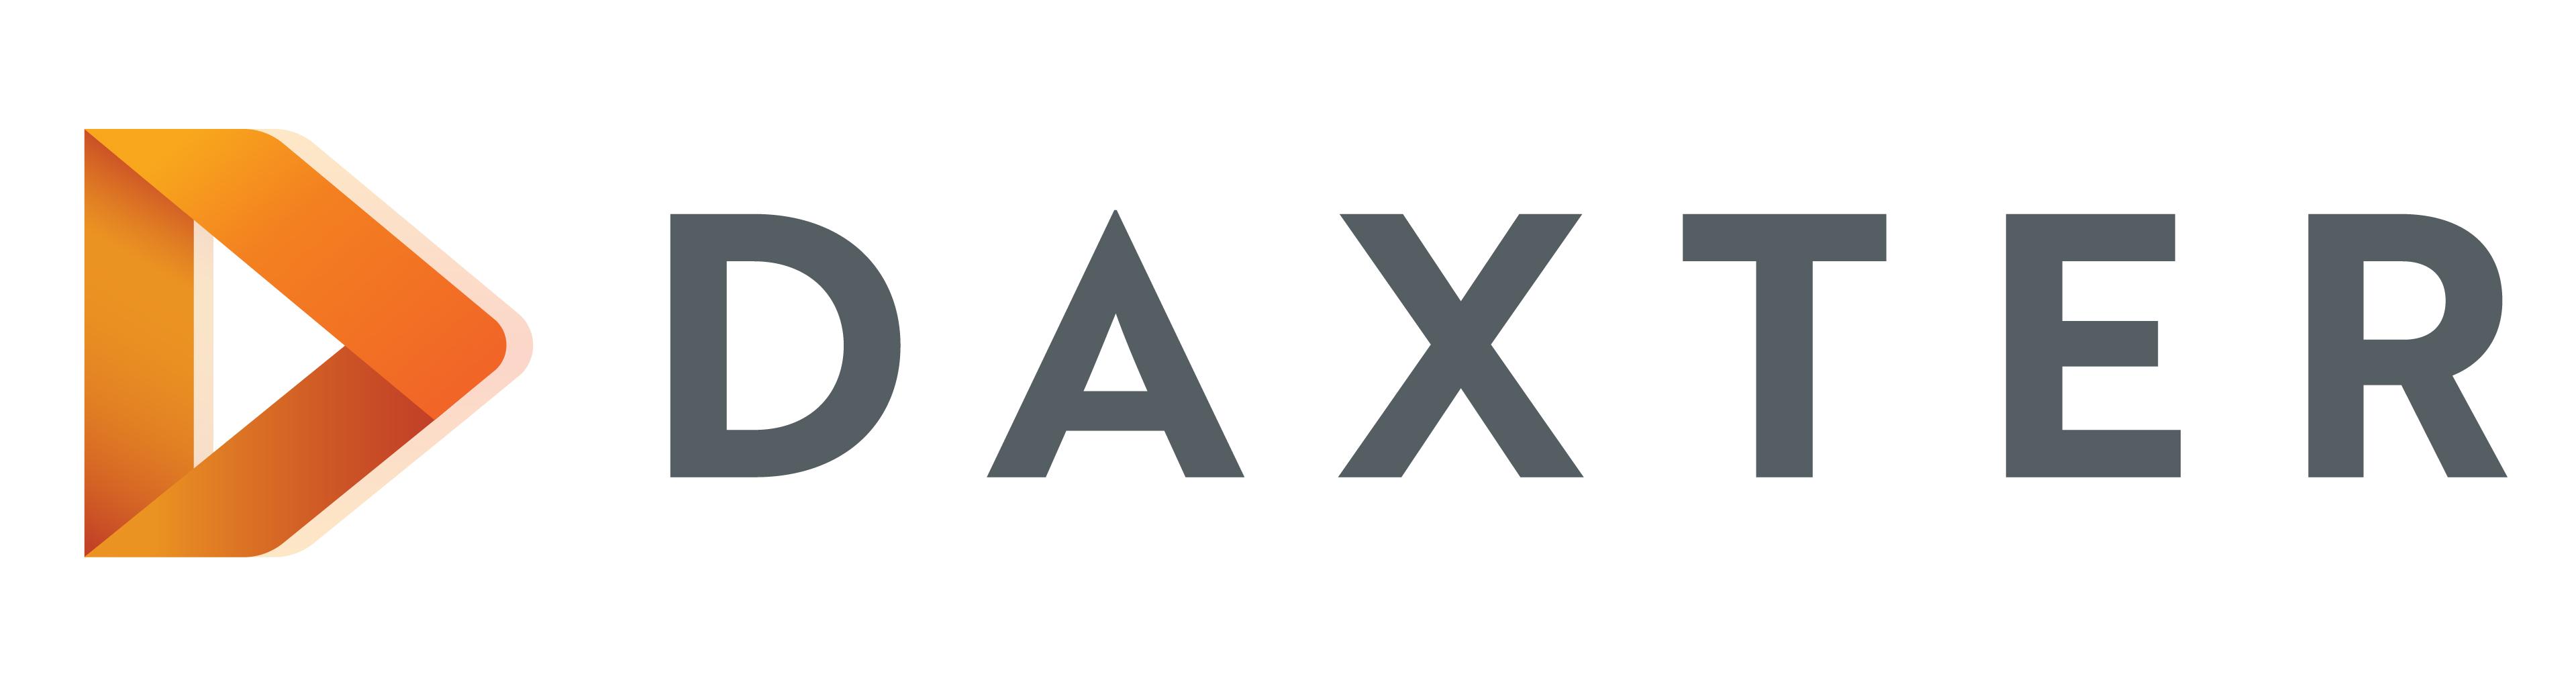 Daxter io Reviews | Customer Service Reviews of Daxter io | https